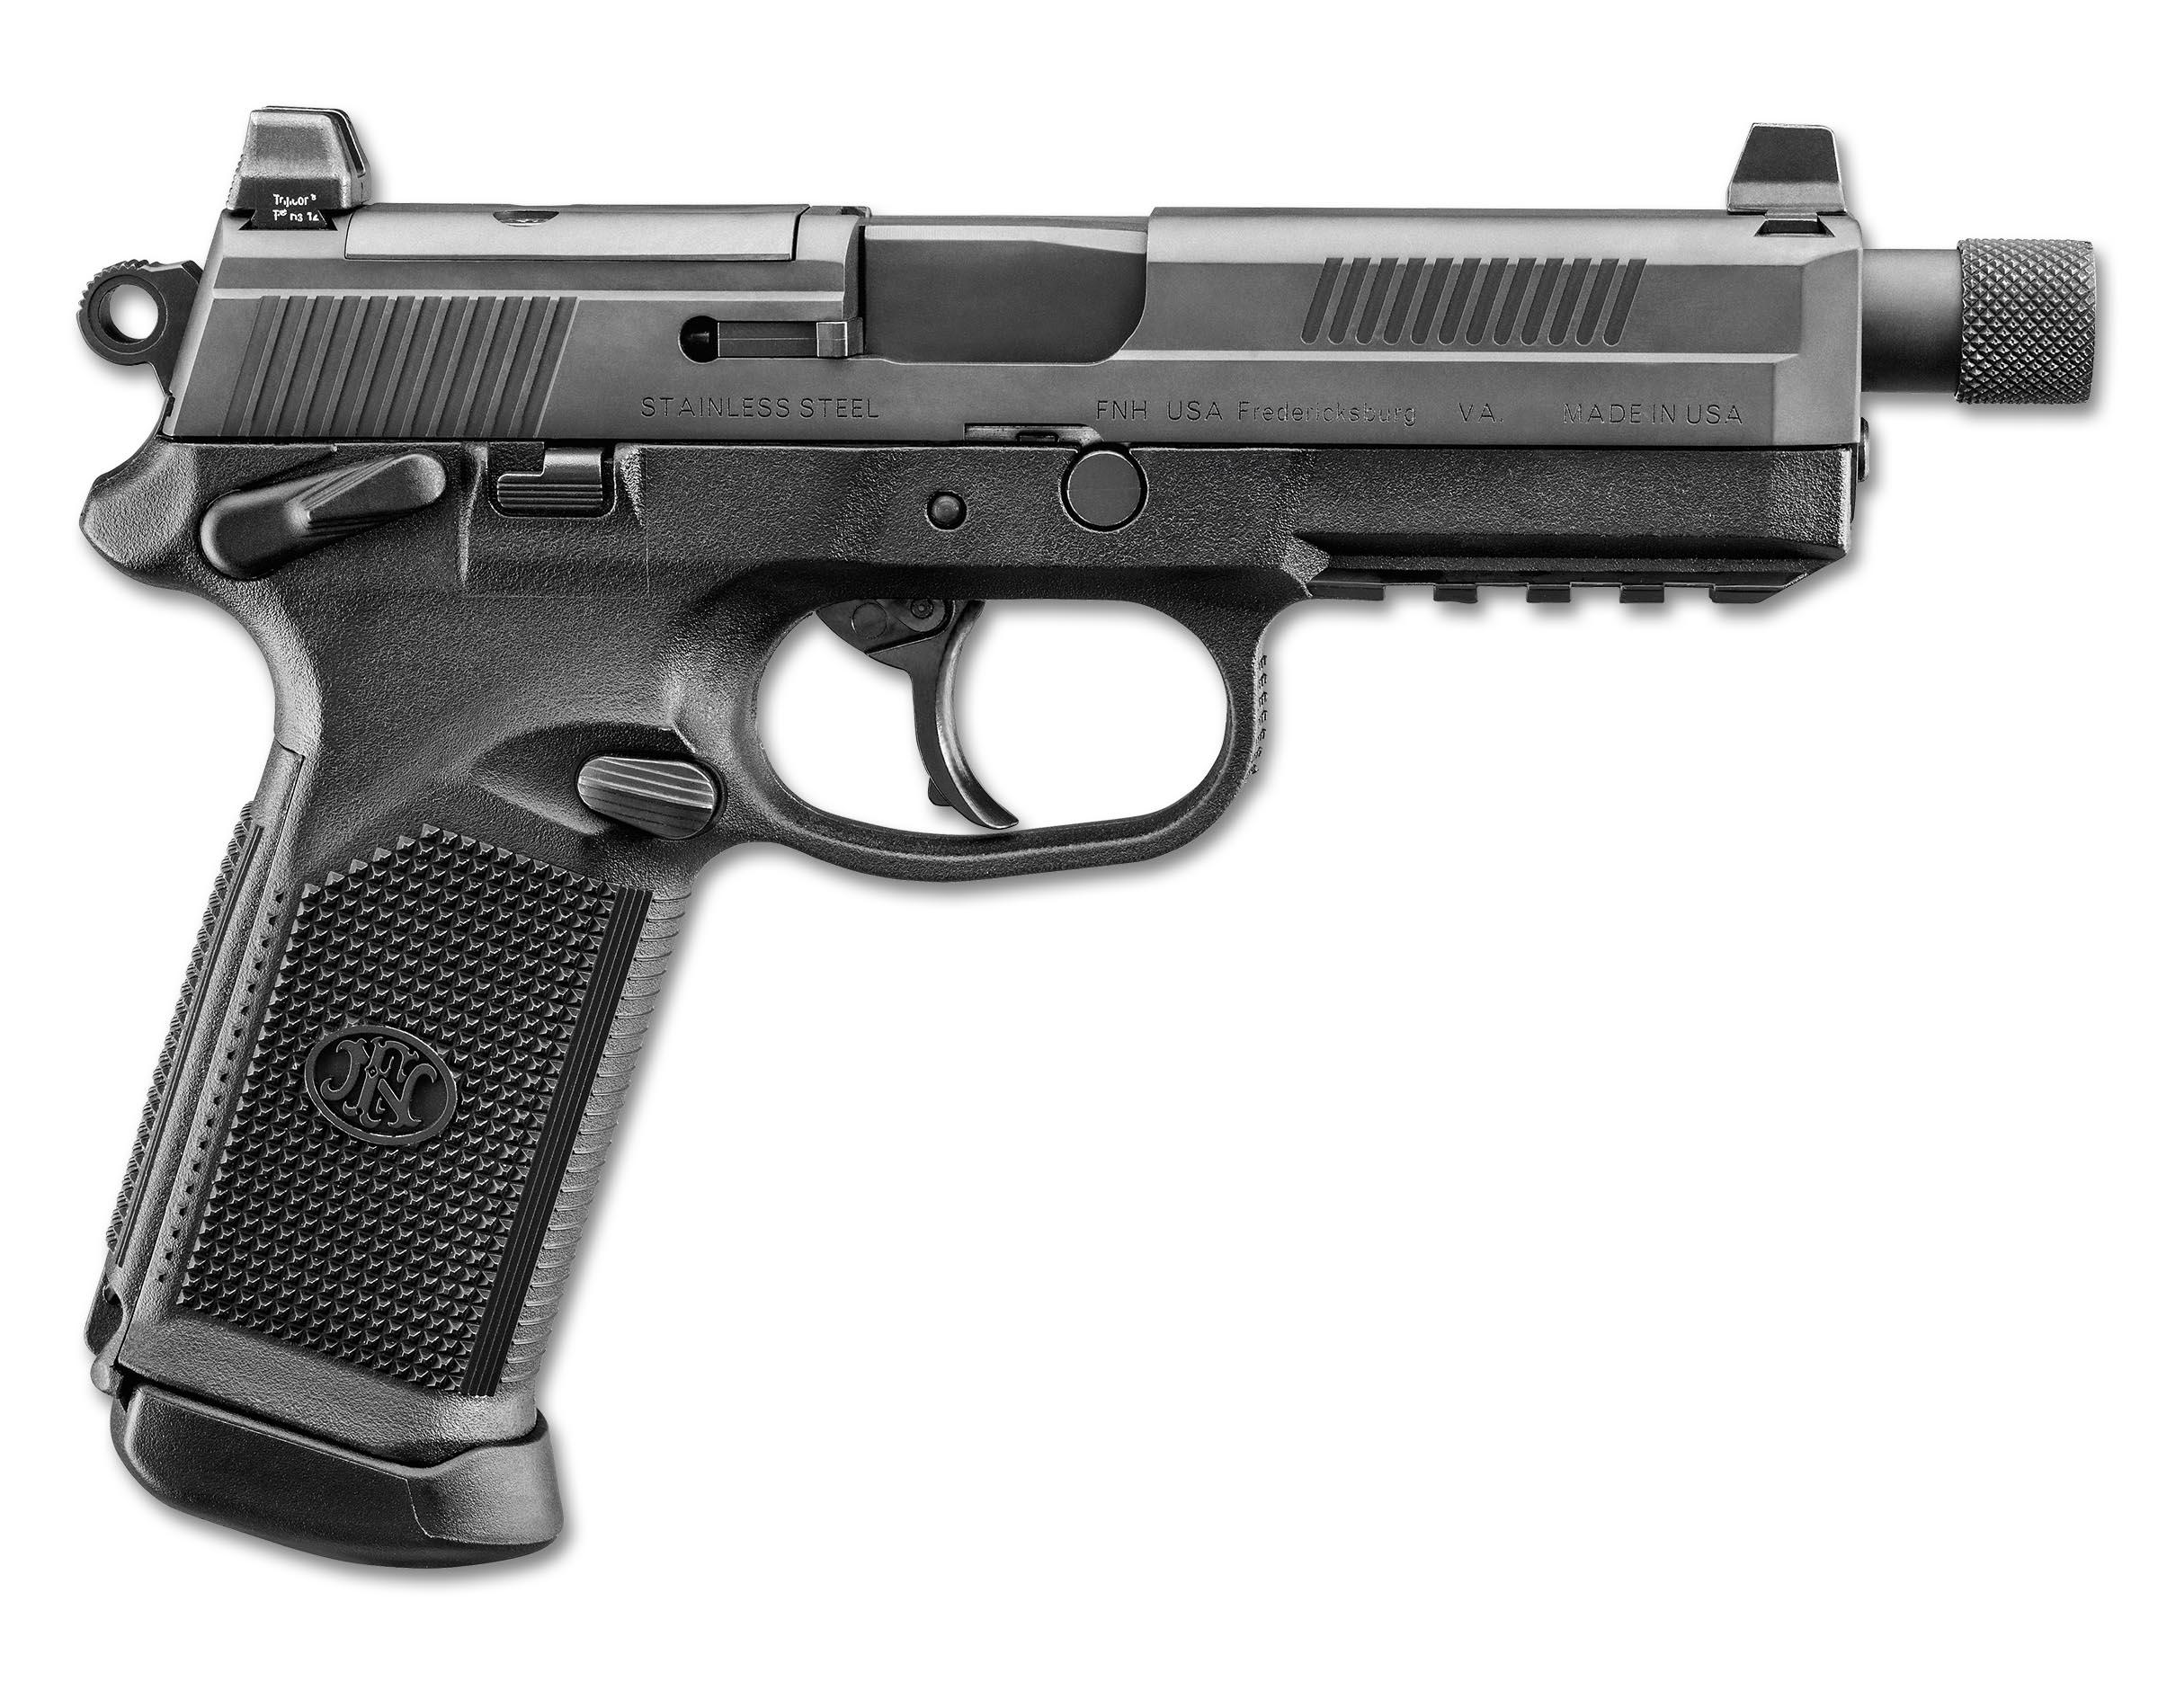 https://cityarsenal.com/product/fnh-fnx-45-tactical-45-acp-pistol-with-threaded-barrel-night-sights-black/